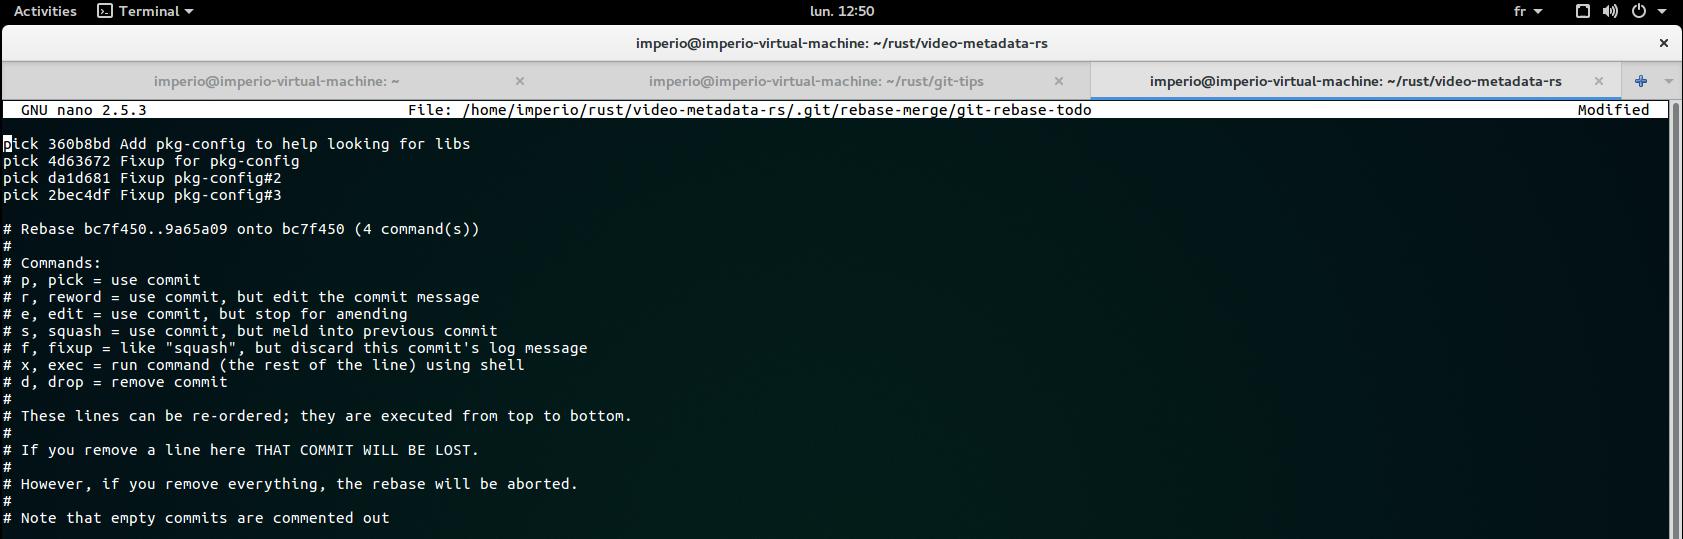 Git rebase screen